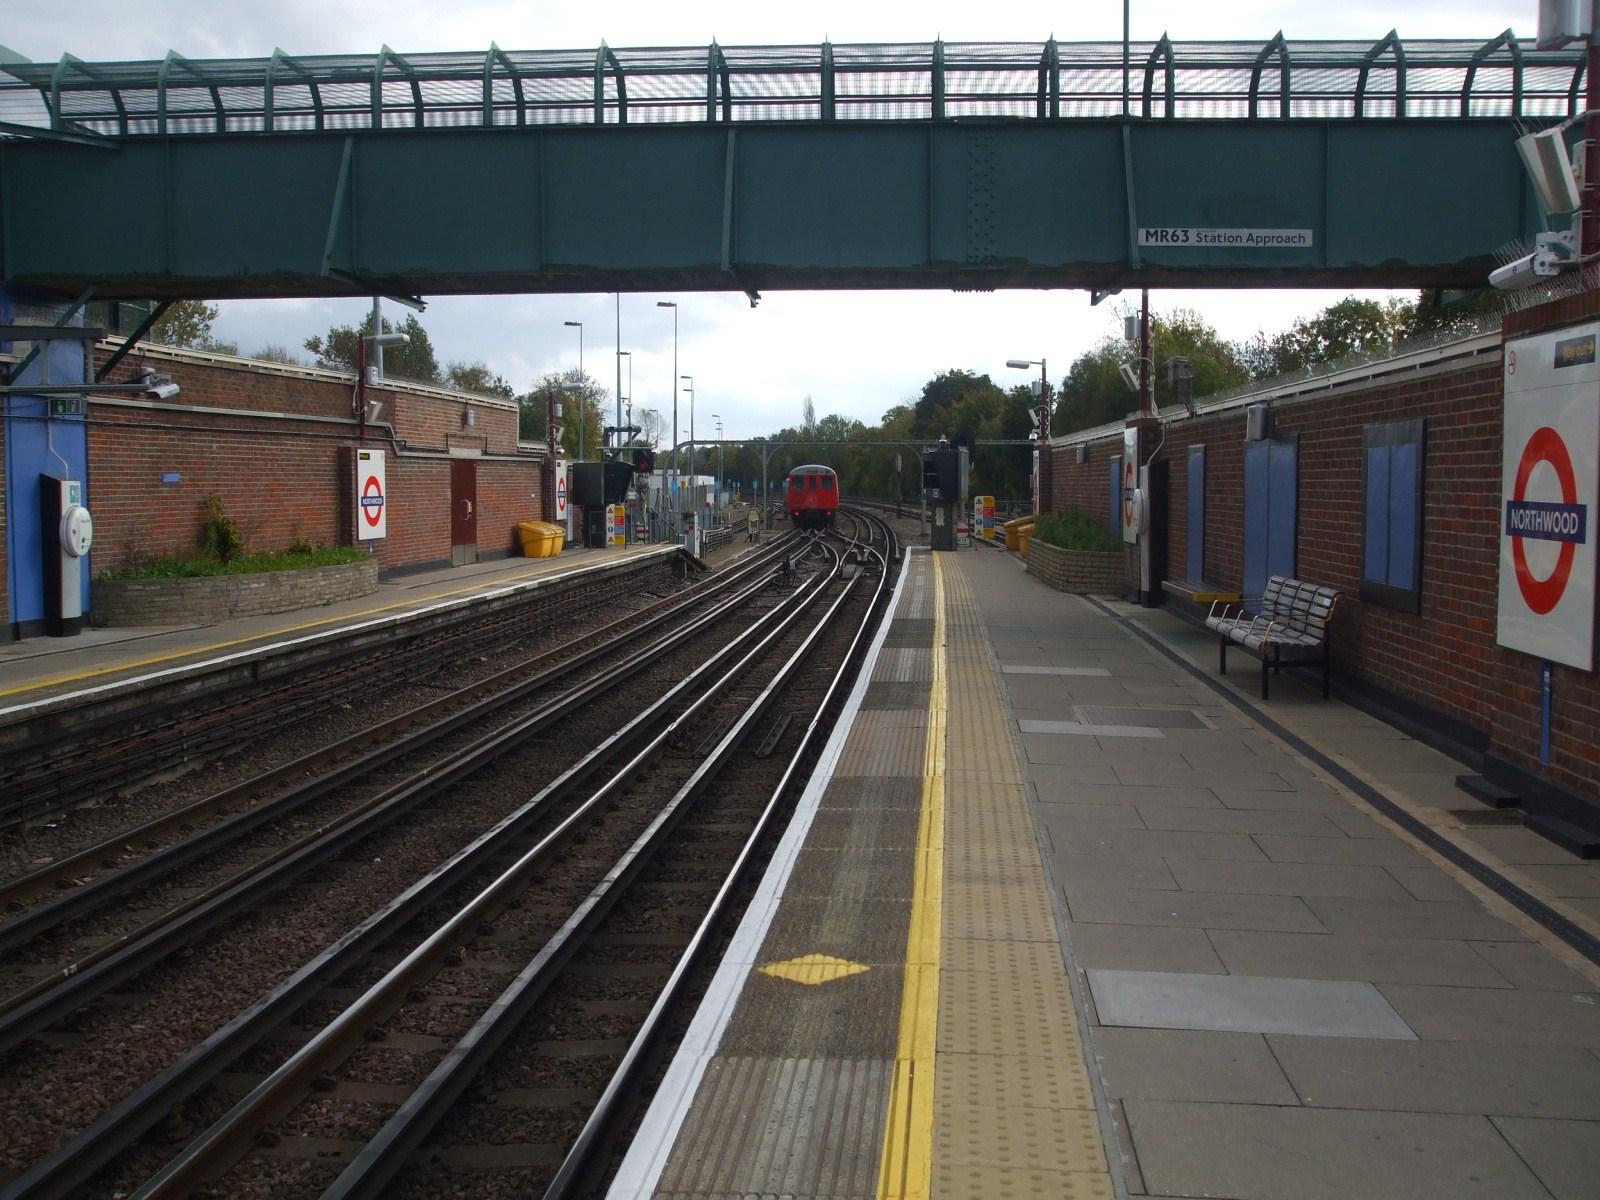 File:Northwood station look east2.JPG - Wikimedia Commons